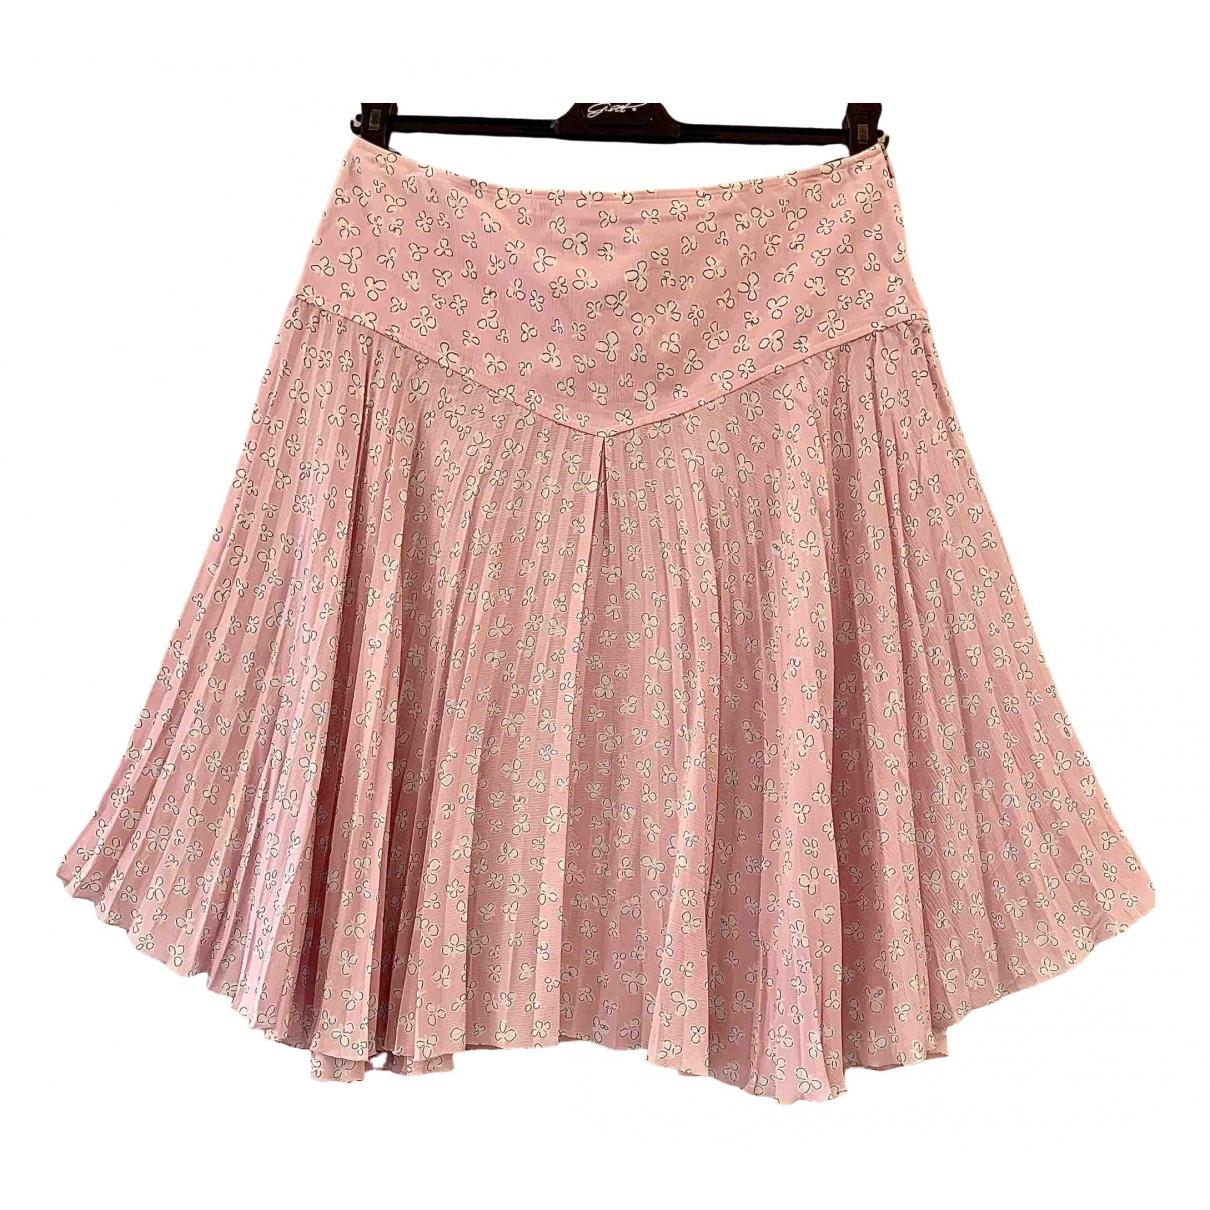 Valentino Garavani \N Pink Silk skirt for Women 44 IT